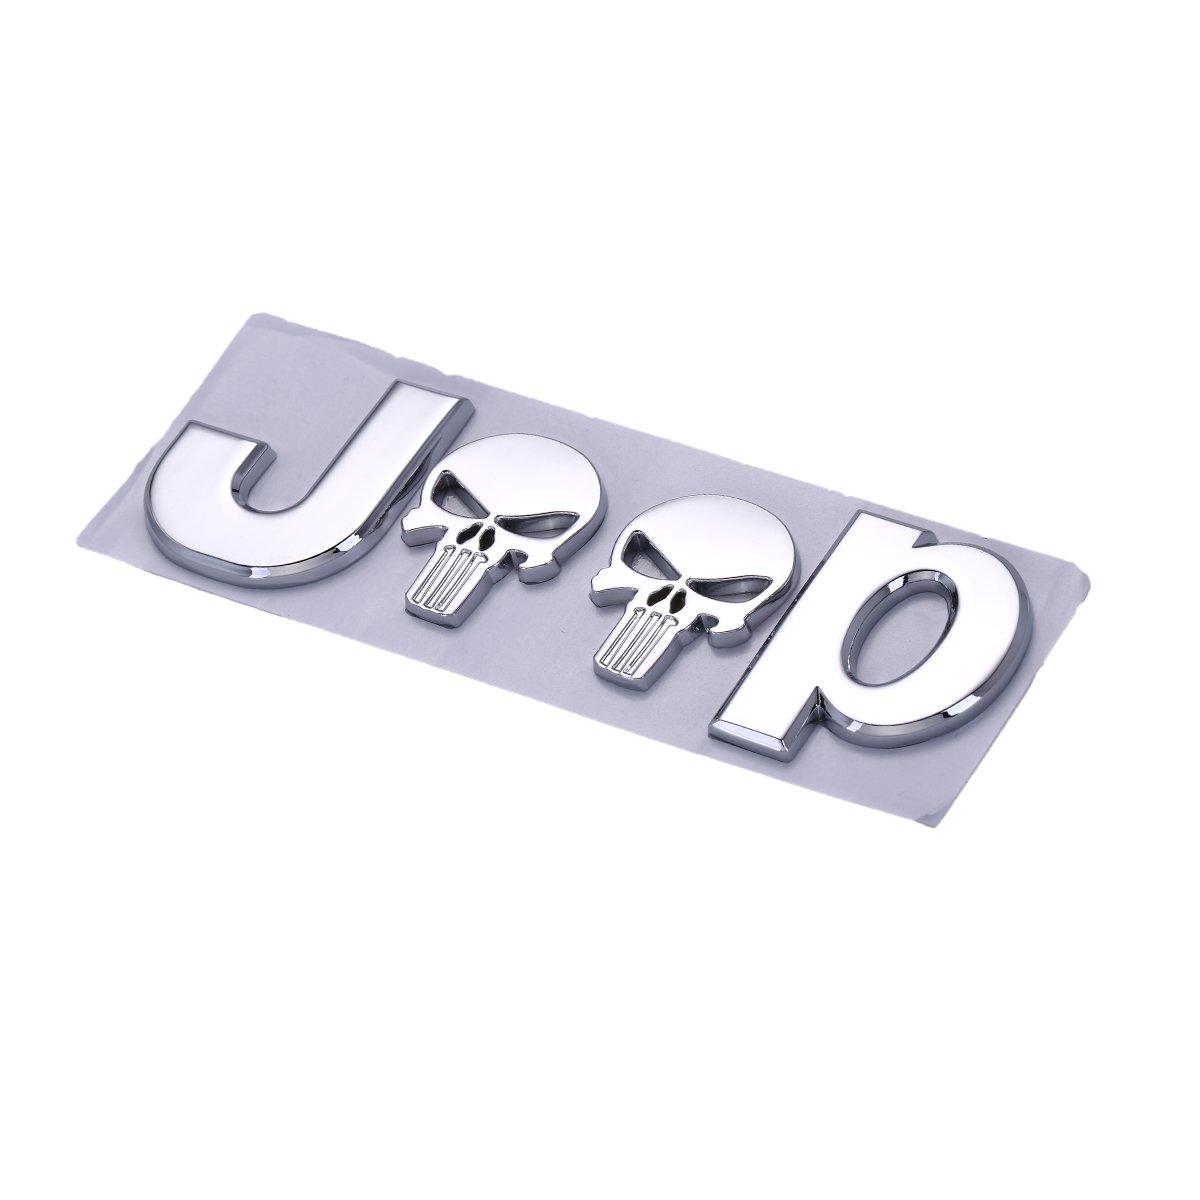 TK-KLZ 4Pcs for Jeep Skull Logo Chrome Metal Sports Style Car License Plate Frame Universal Bolt Screws for Chrysler JEEP Grand Cherokee Wrangler Compass Cherokee Renegade Patriot Grand Comander